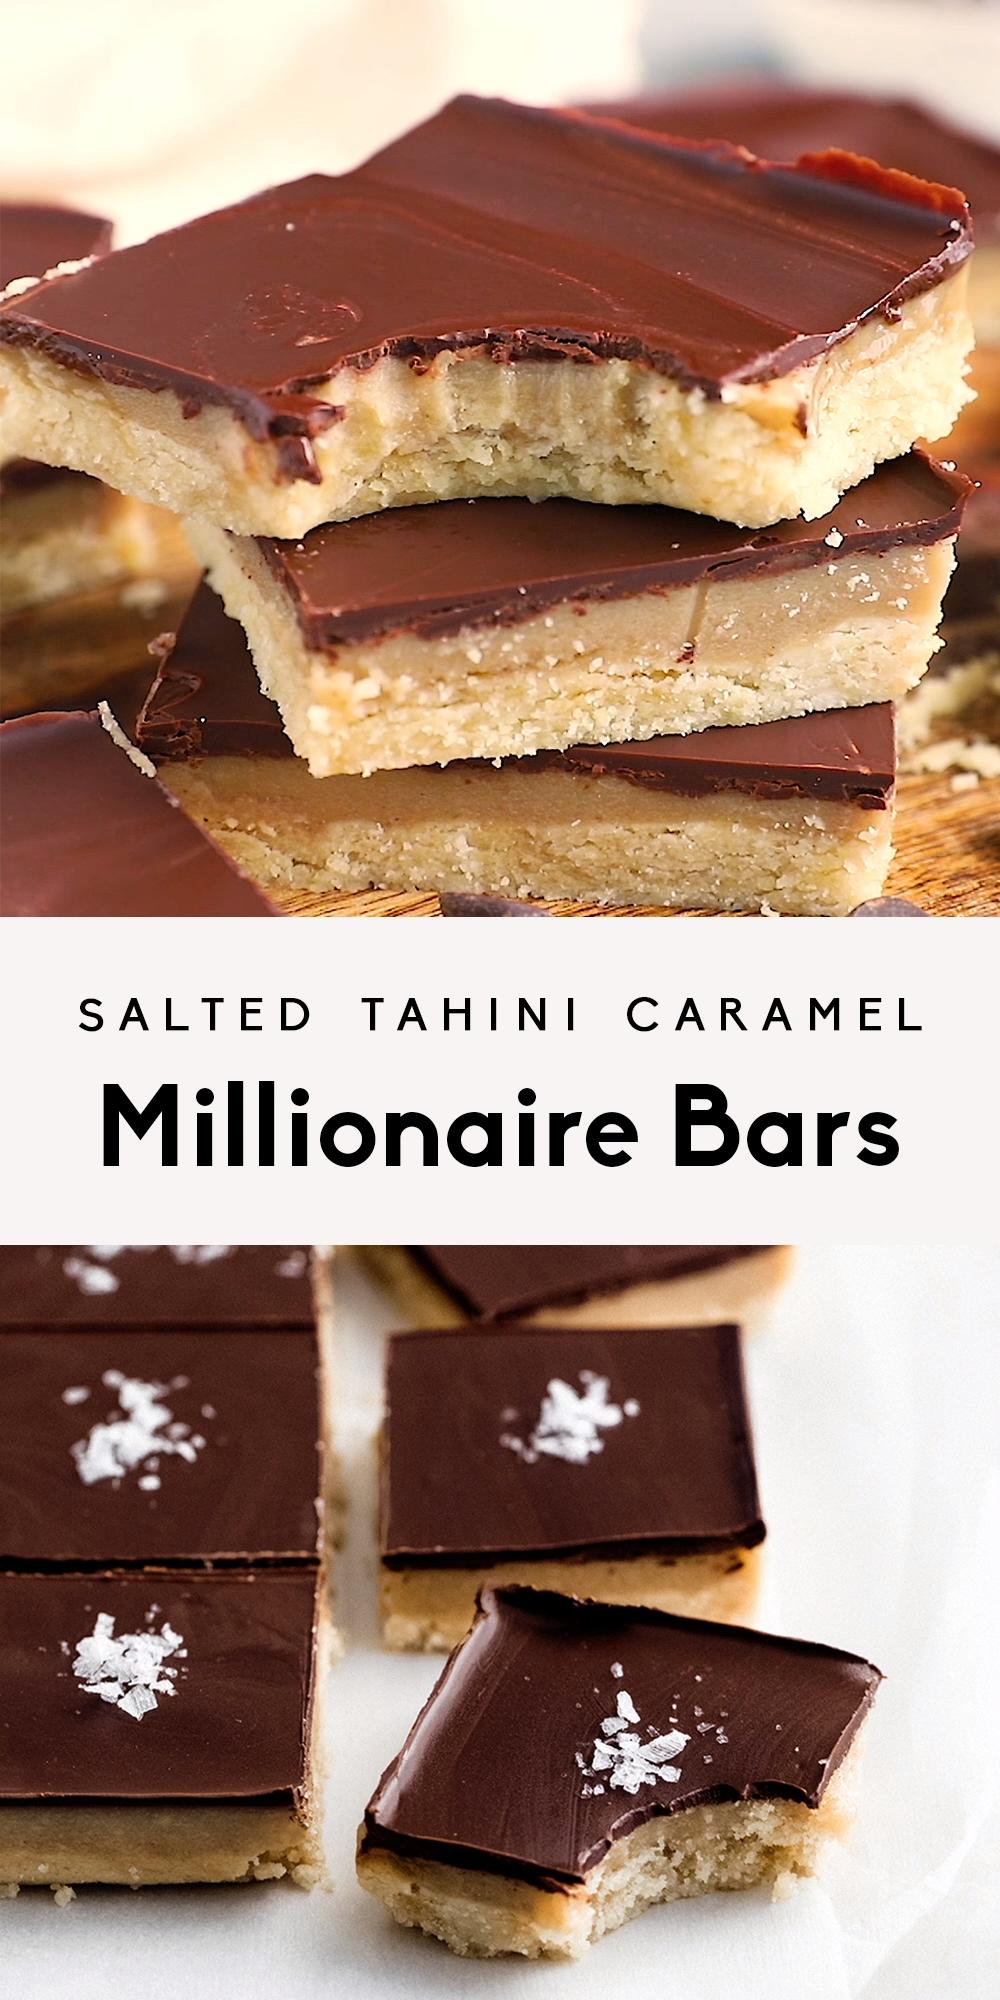 Source The post Salted Tahini Caramel Millionaire Bars (vegan + paleo) appeared first on Vorgeschlagene Nachrichten.